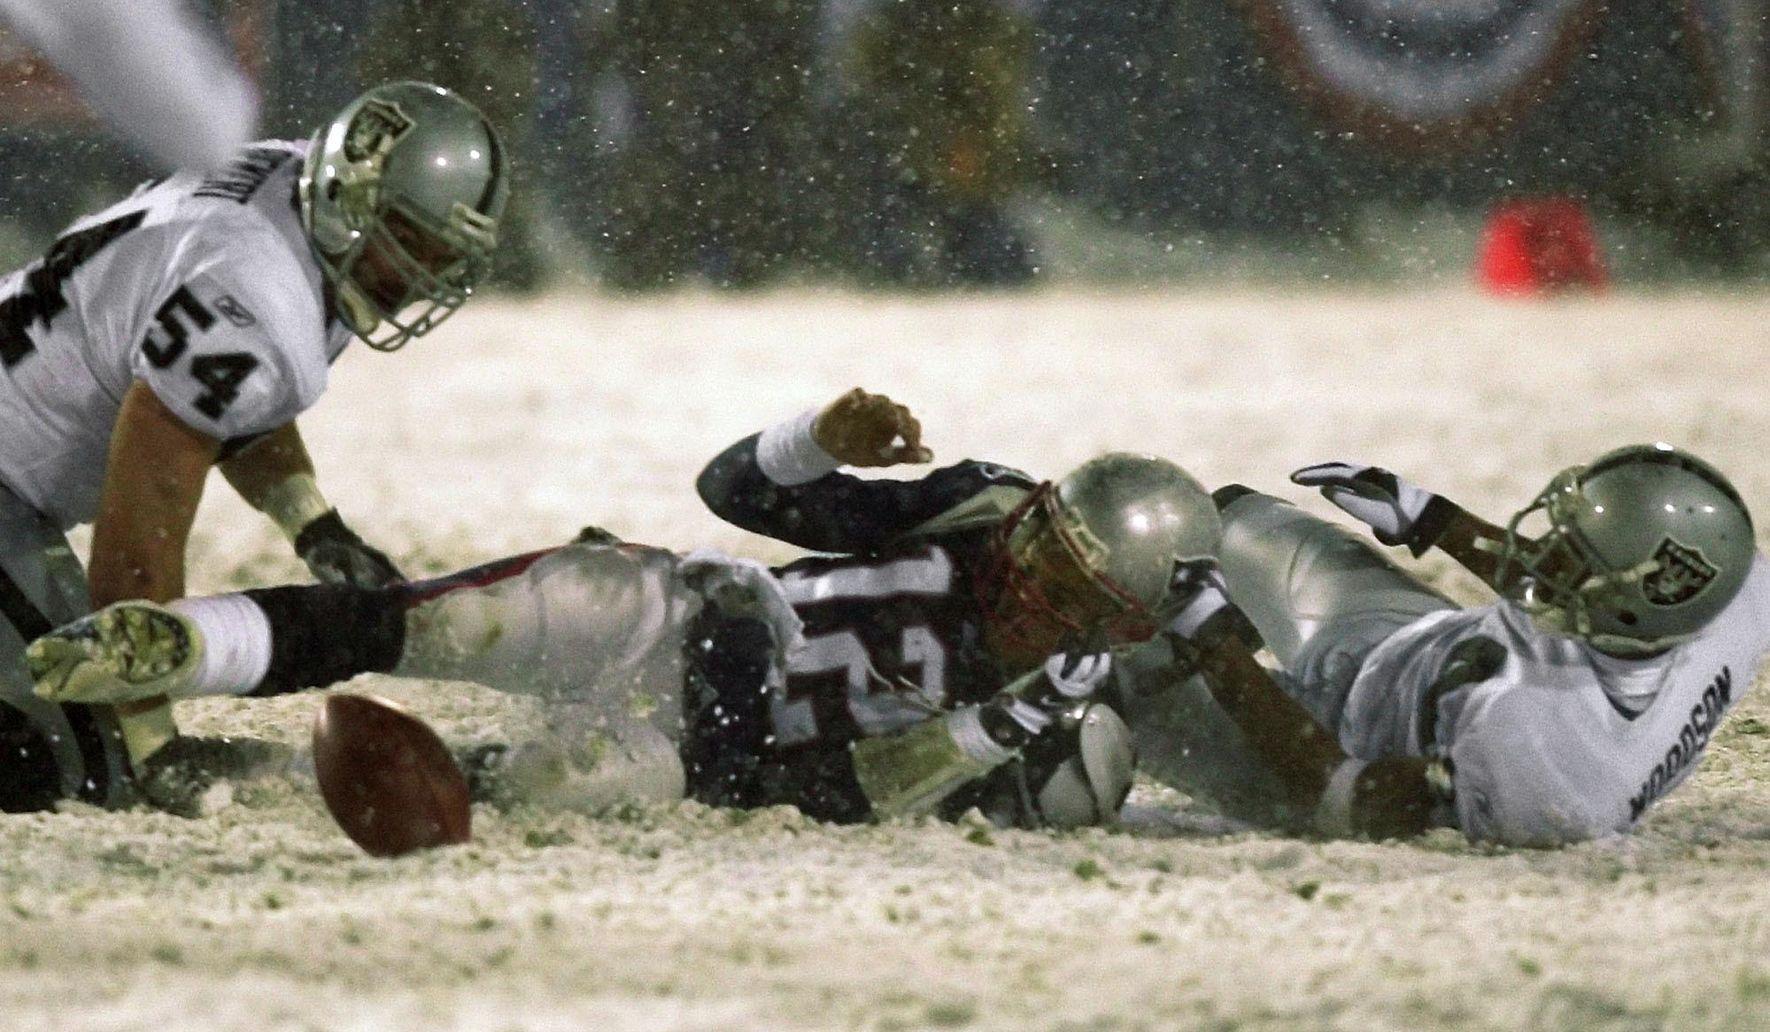 Raiders-patriots_preview_football_04984_c0-6-2000-1172_s1770x1032